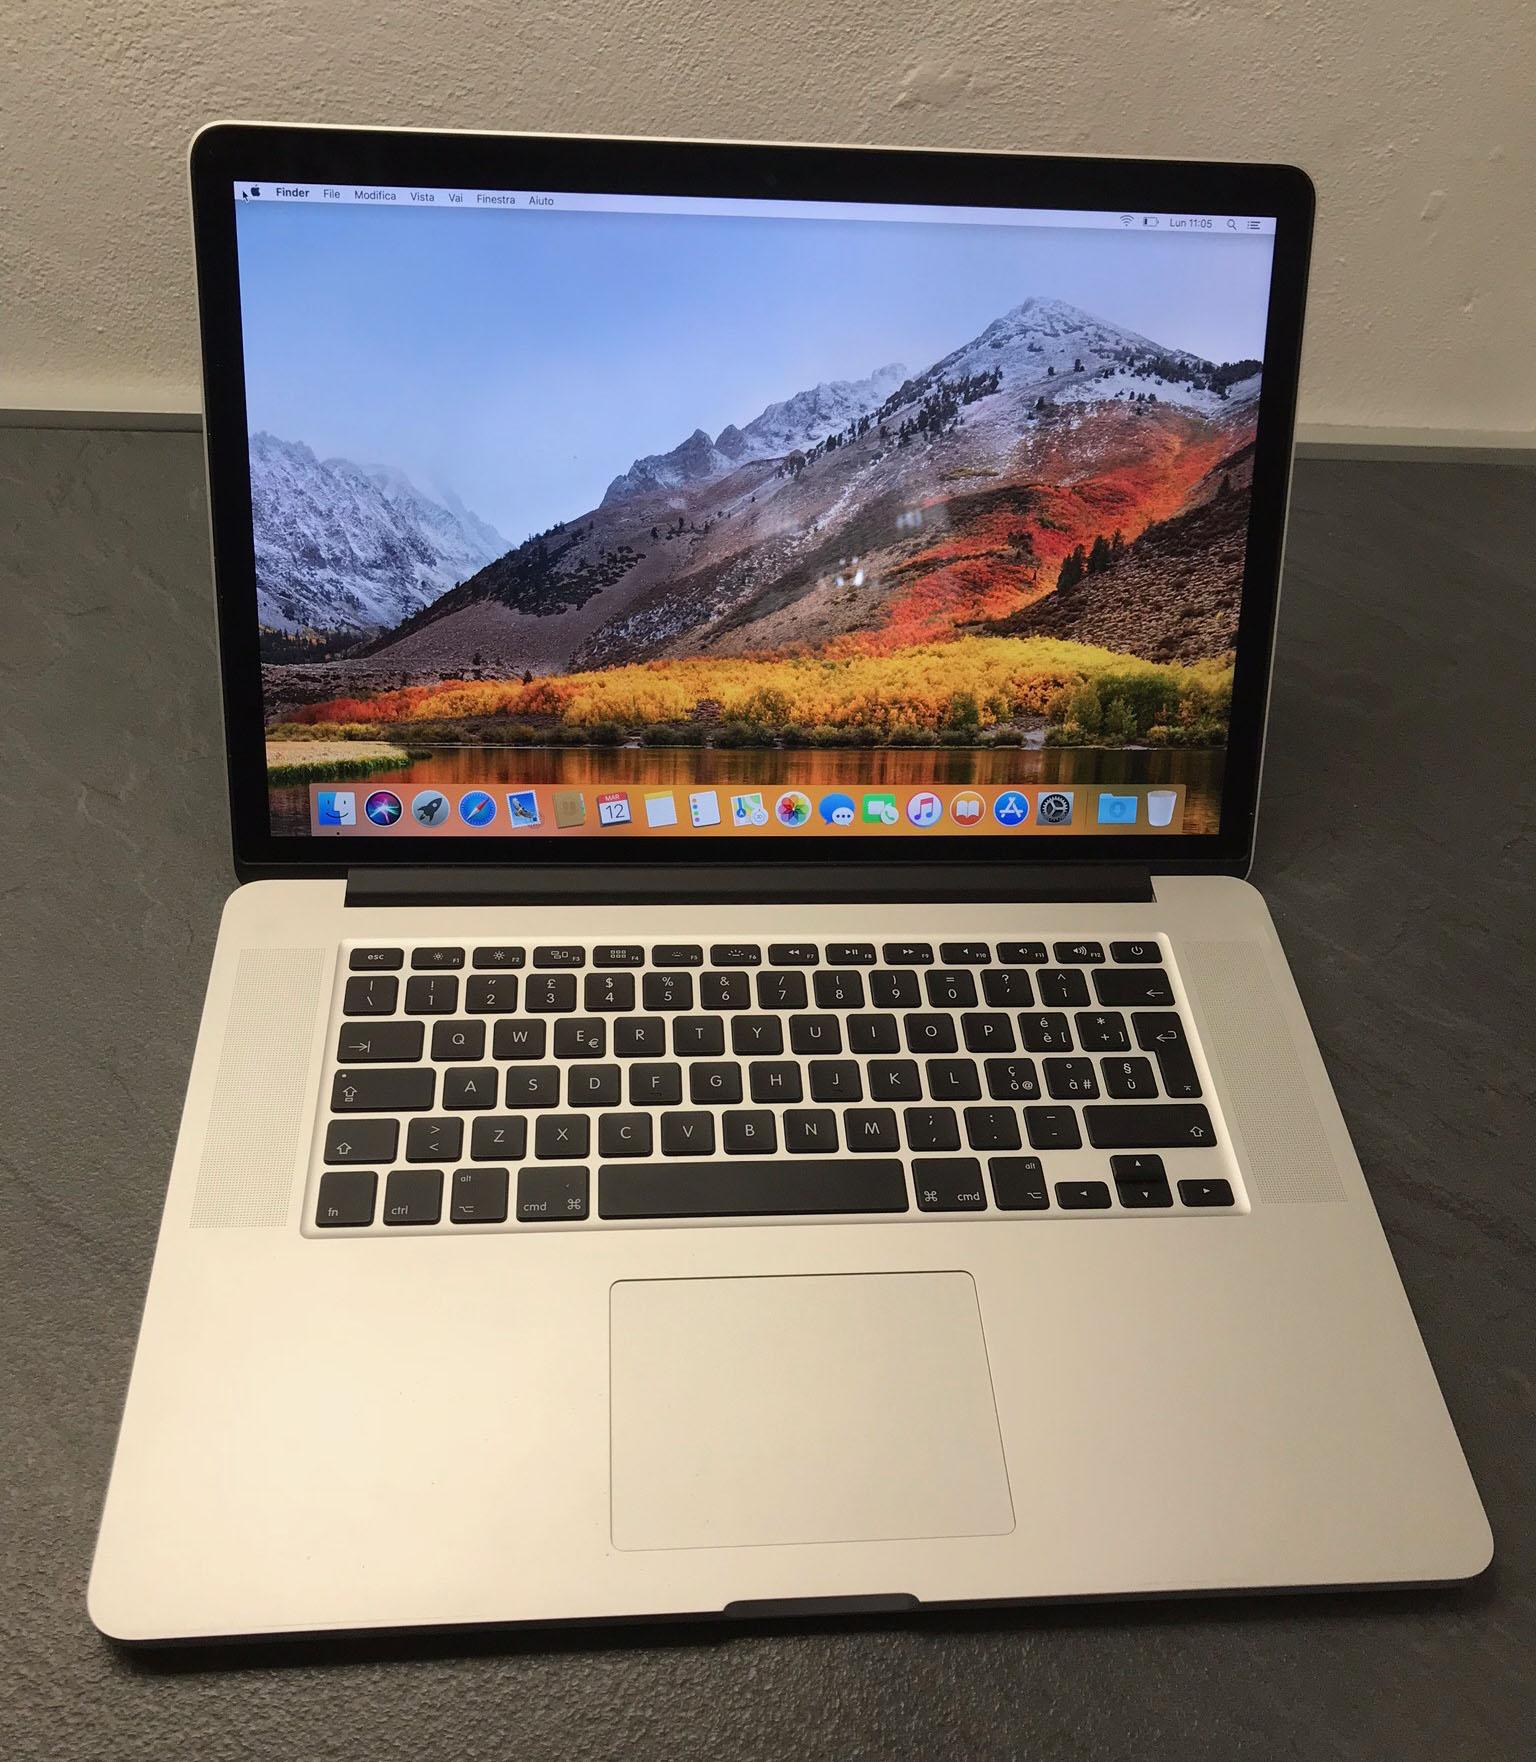 Macbook Pro 15 fine 2013